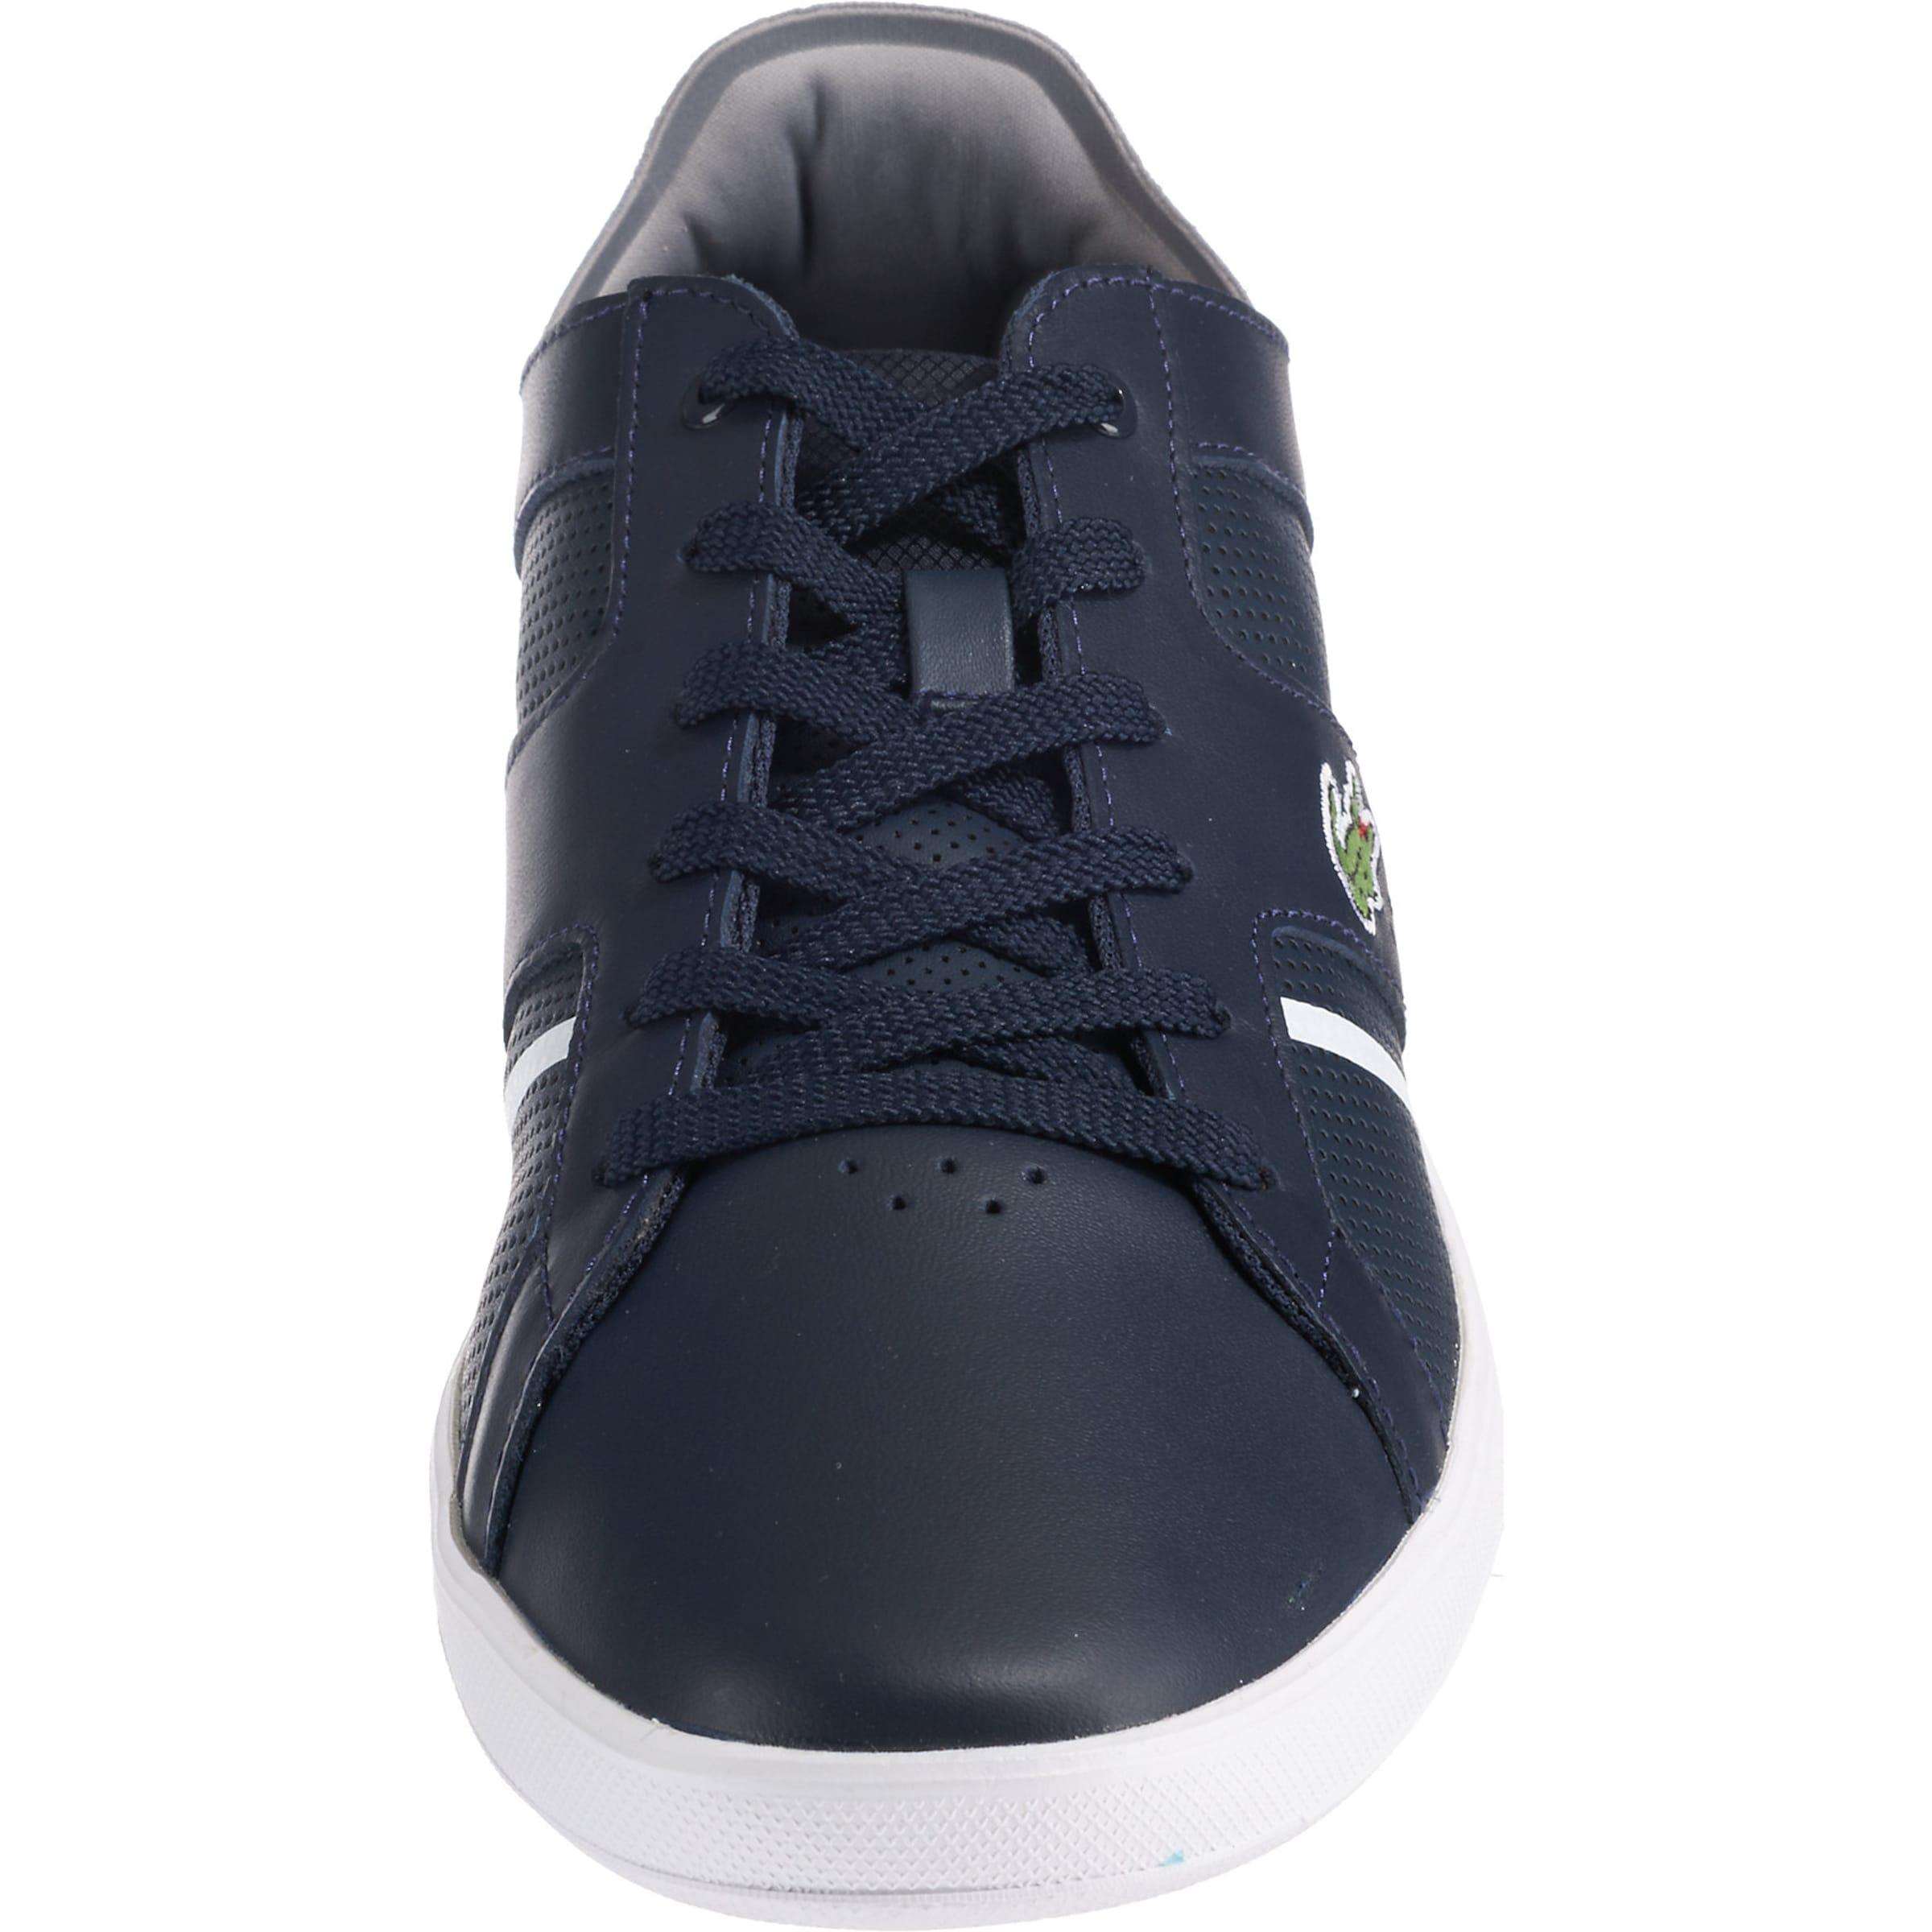 HerrenSneaker 1 In Navy Lacoste 119 'novas Sma' LzVpUMqSG